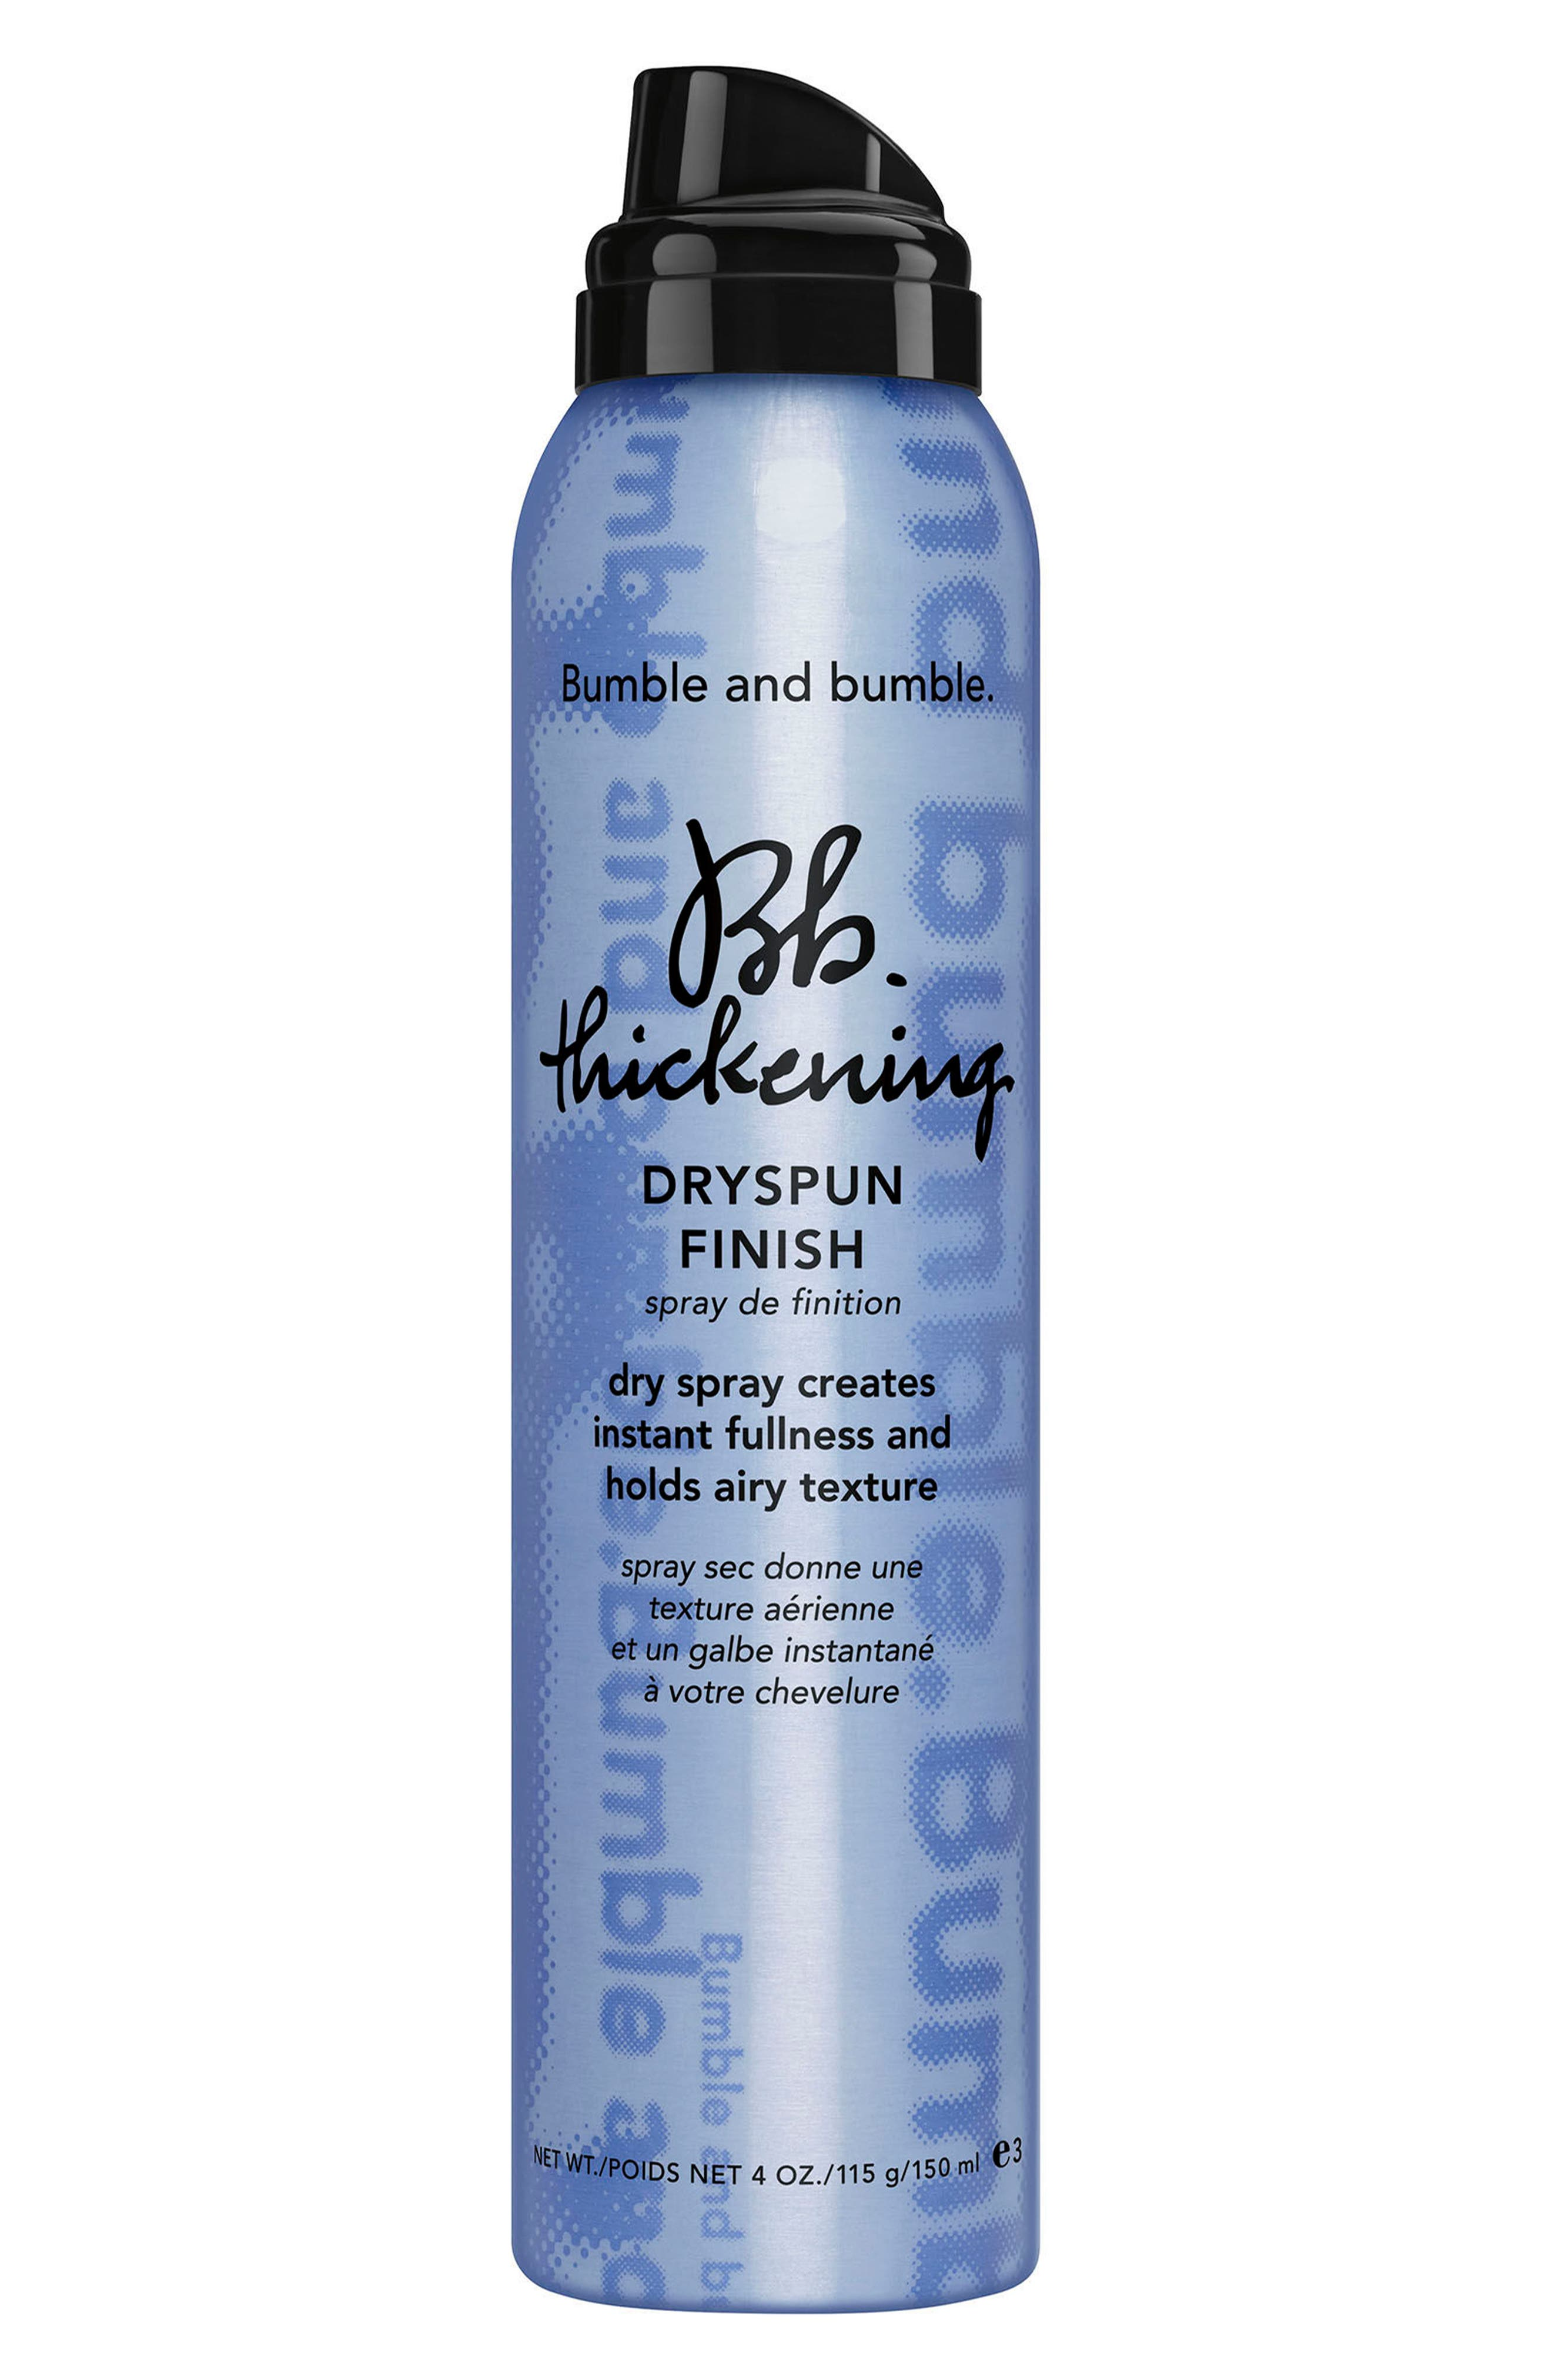 Thickening Dryspun Finish Dry Spray,                             Main thumbnail 1, color,                             NO COLOR